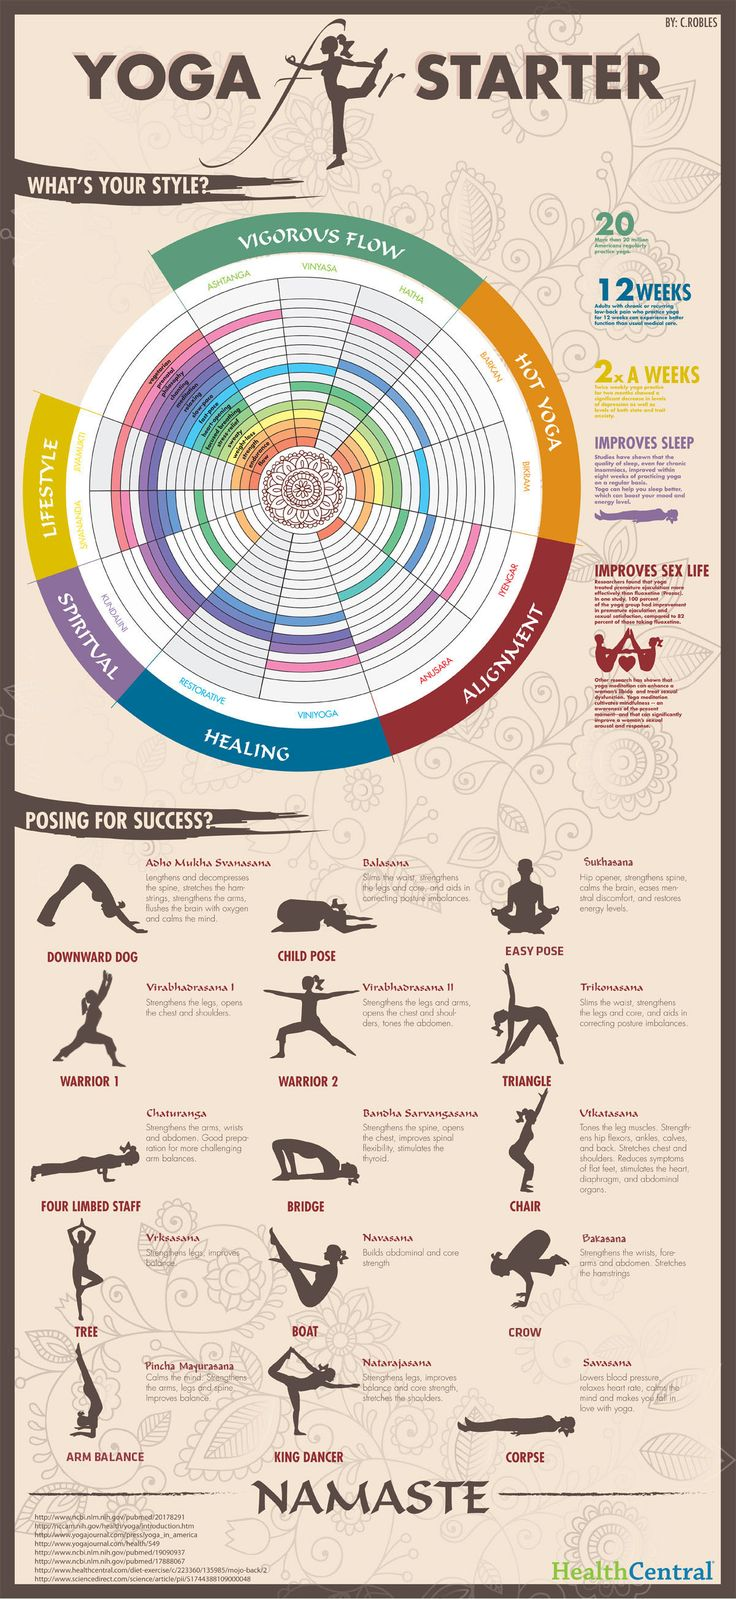 http://zenactivesports.com/wp-content/uploads/2013/08/Yoga-for-Starters-Infographic.jpg